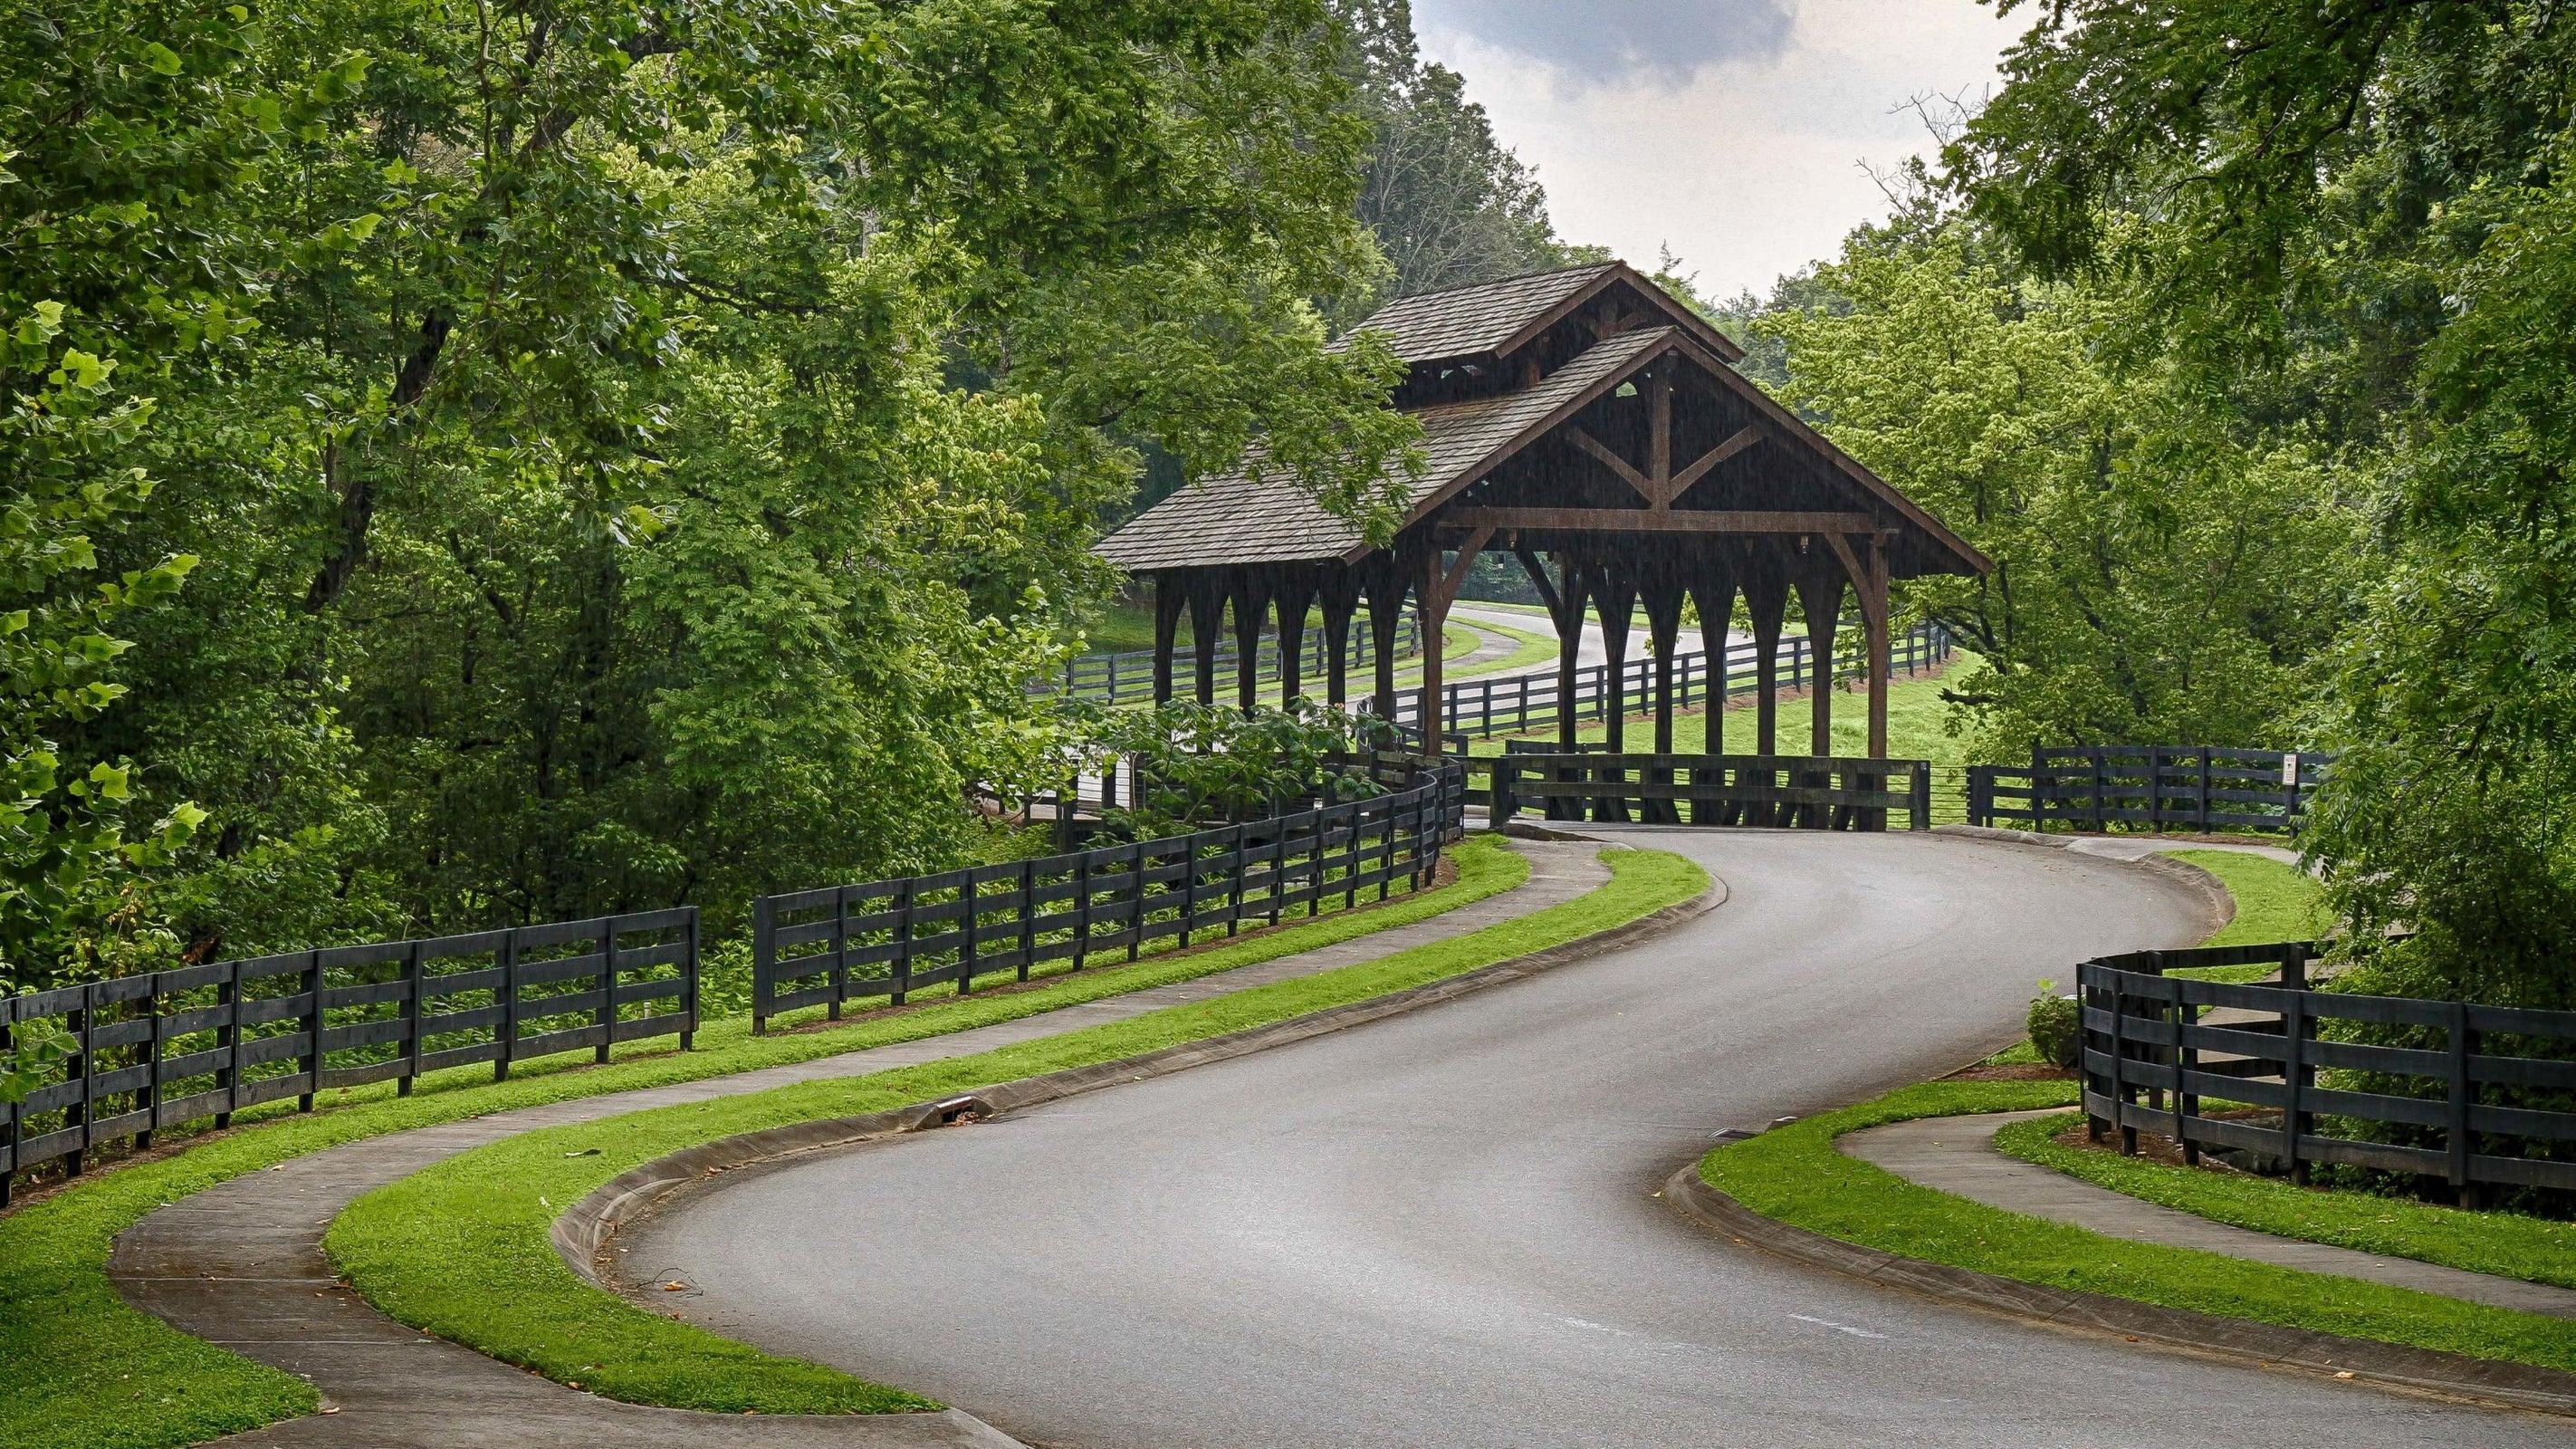 Landmark Covered Bridge